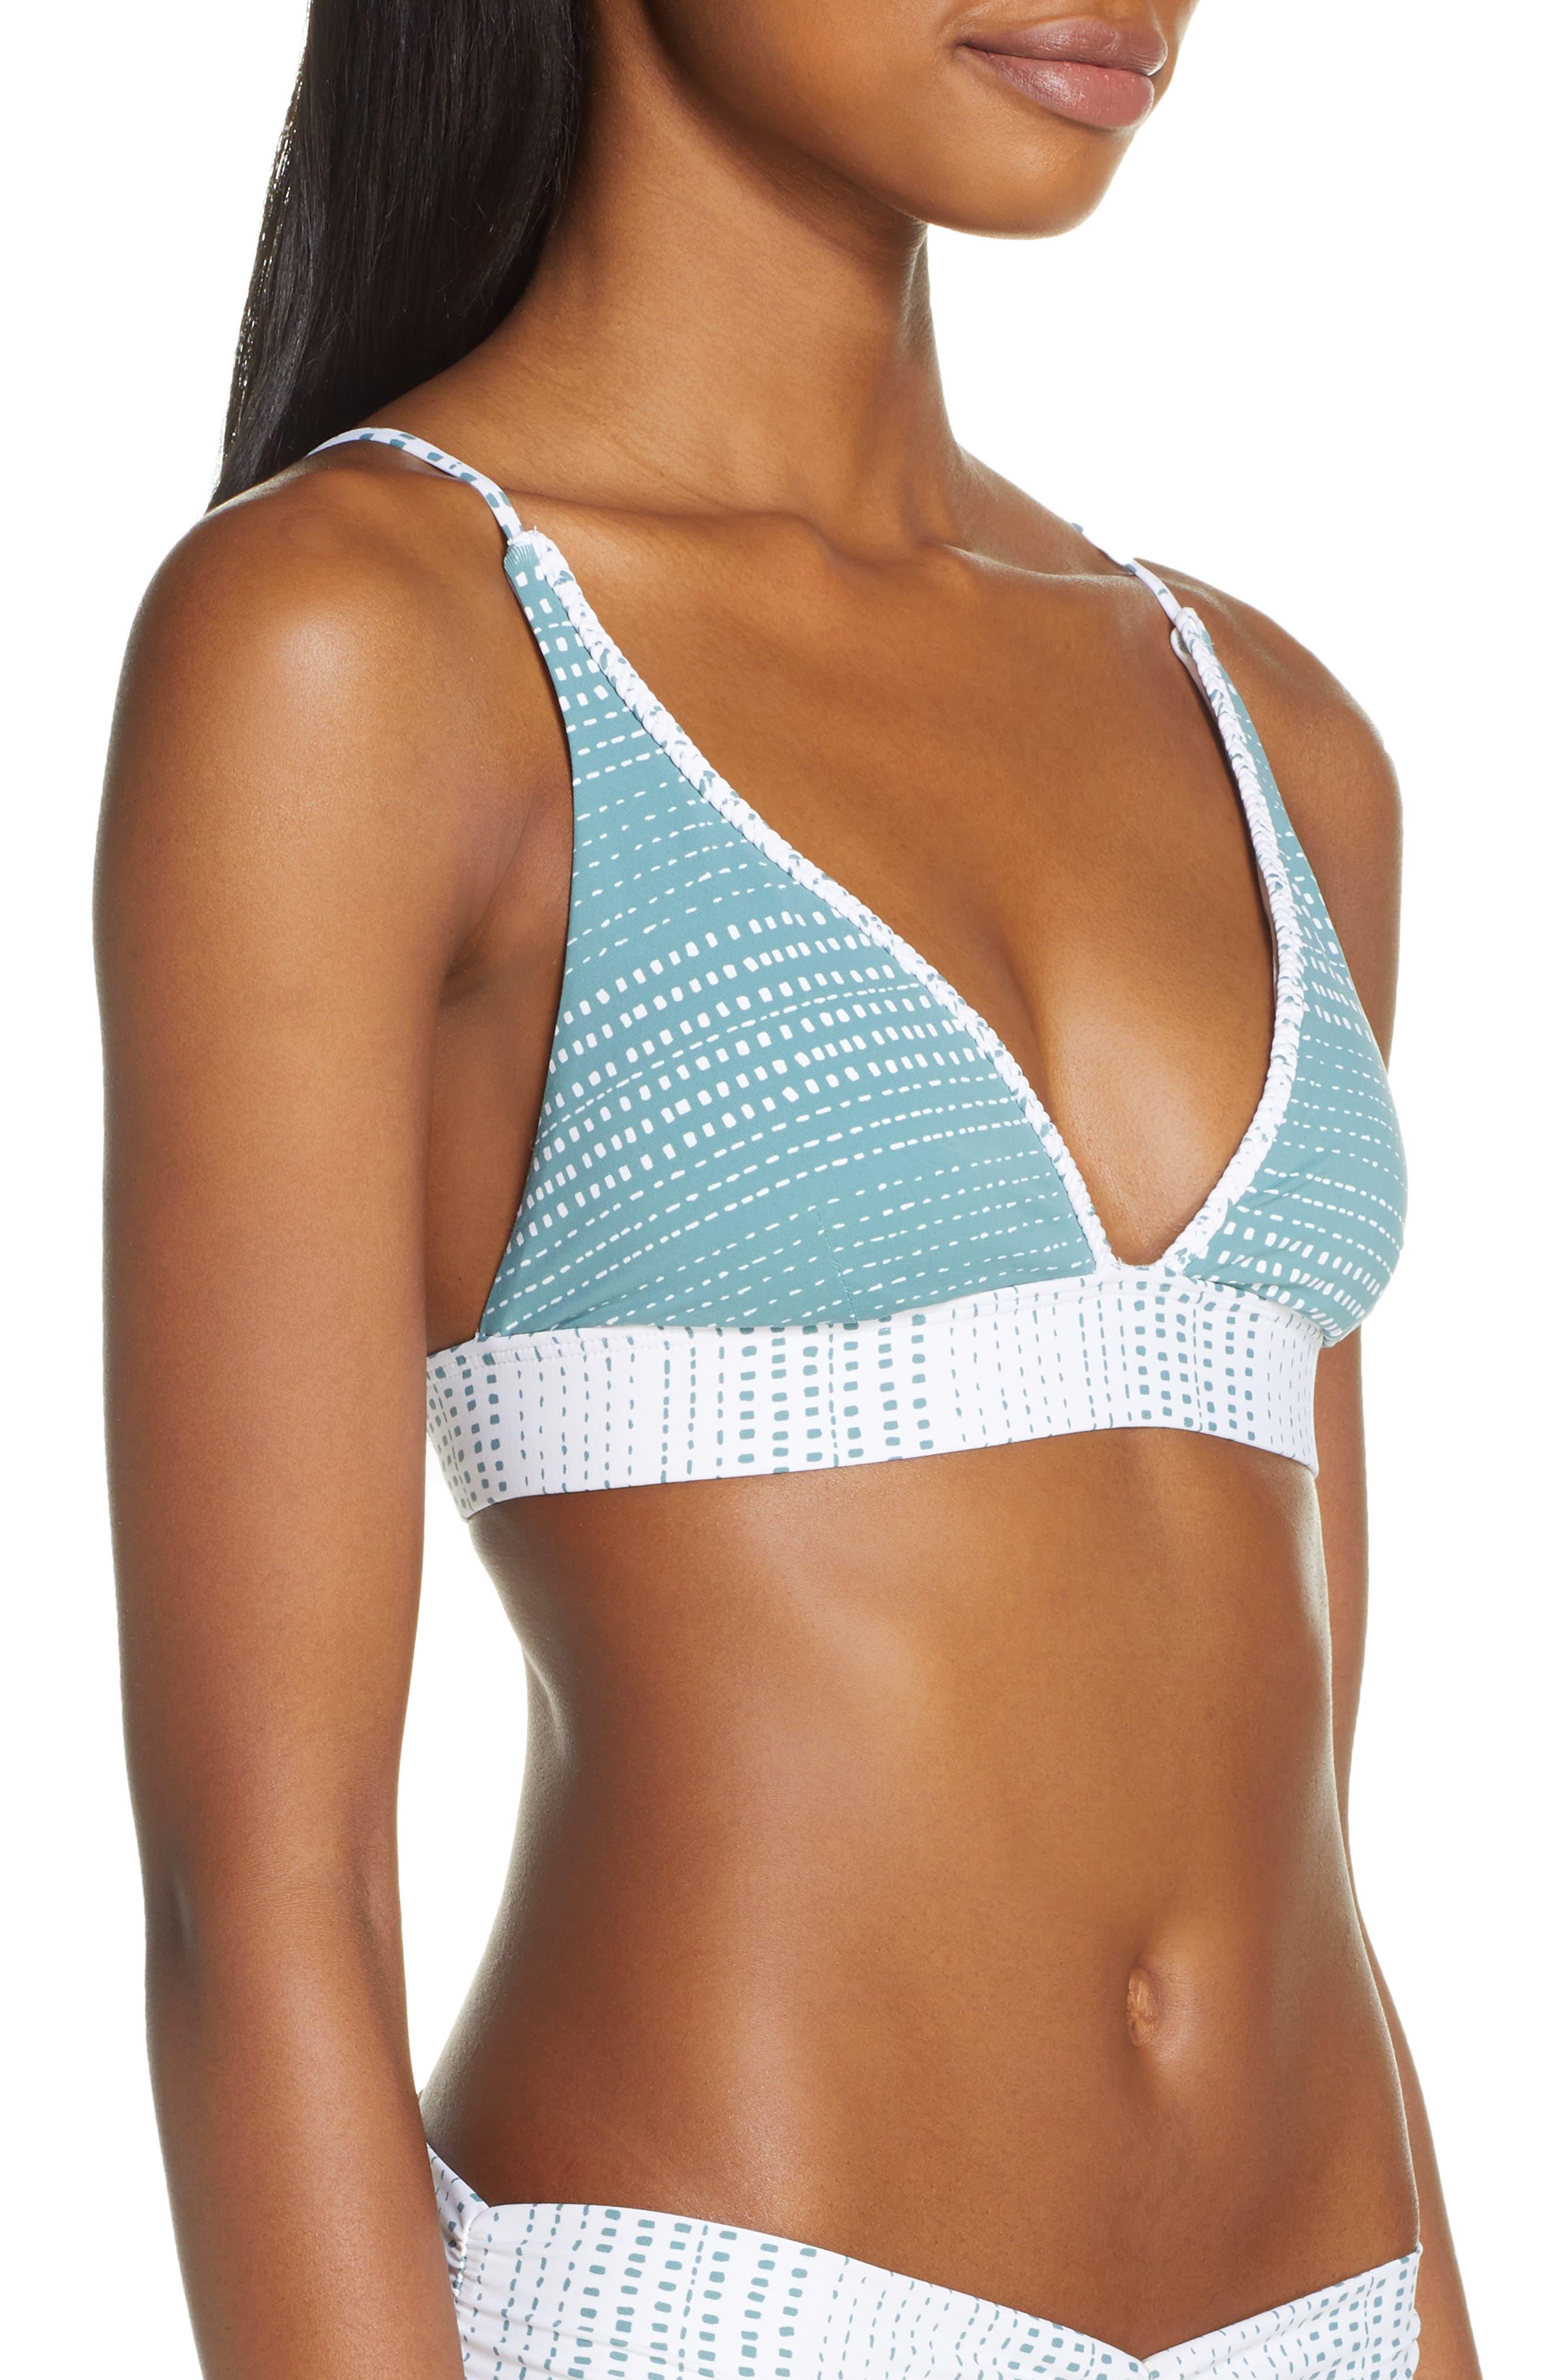 DOLCE VITA, Mojave Bikini Top, Alternate thumbnail 4, color, AGAVE